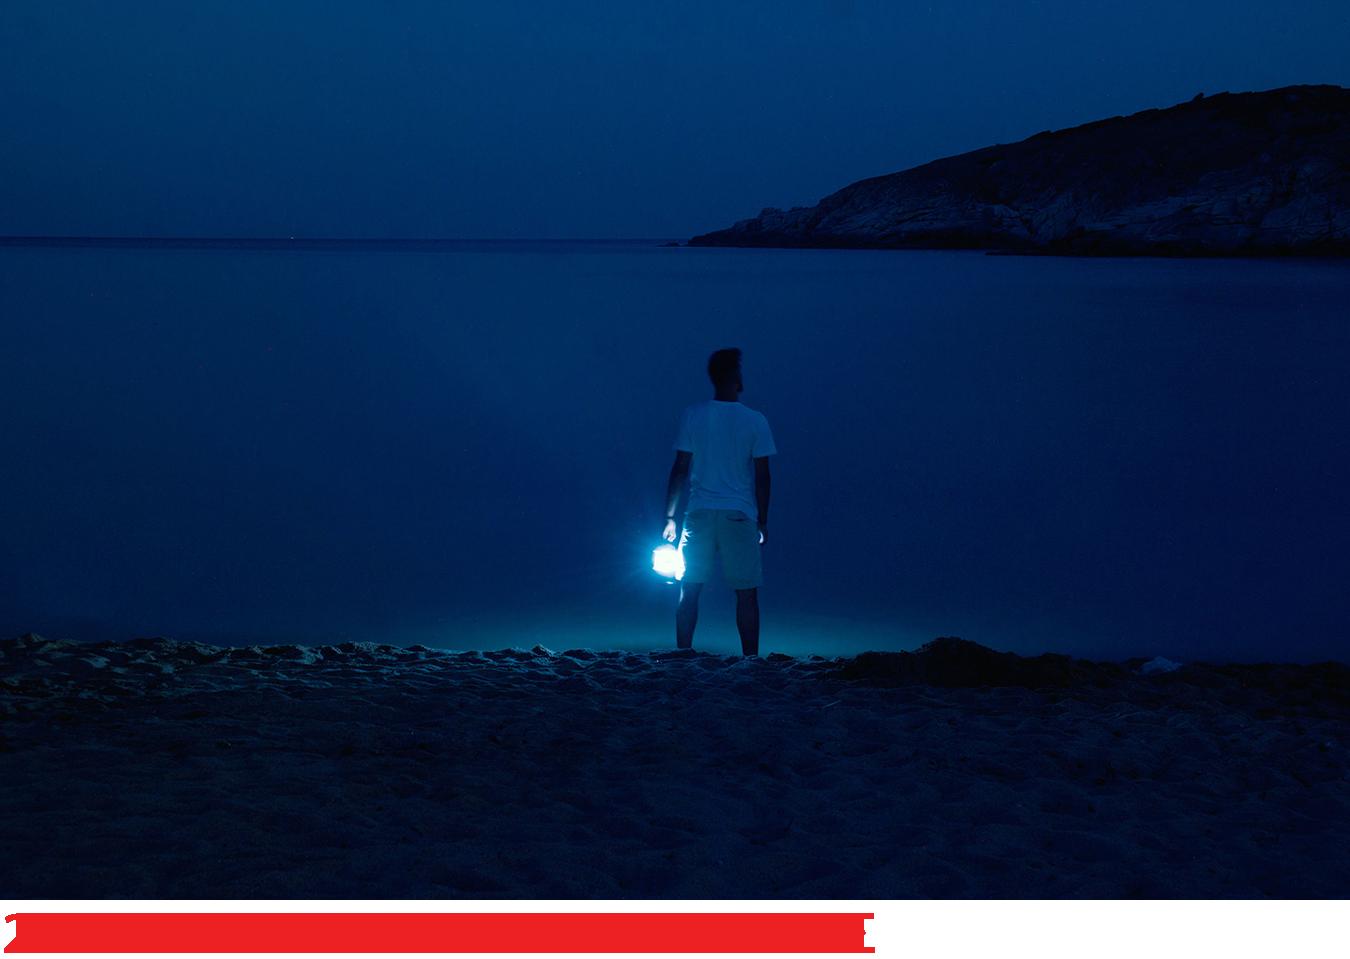 esp_2nd_tasiopoulos